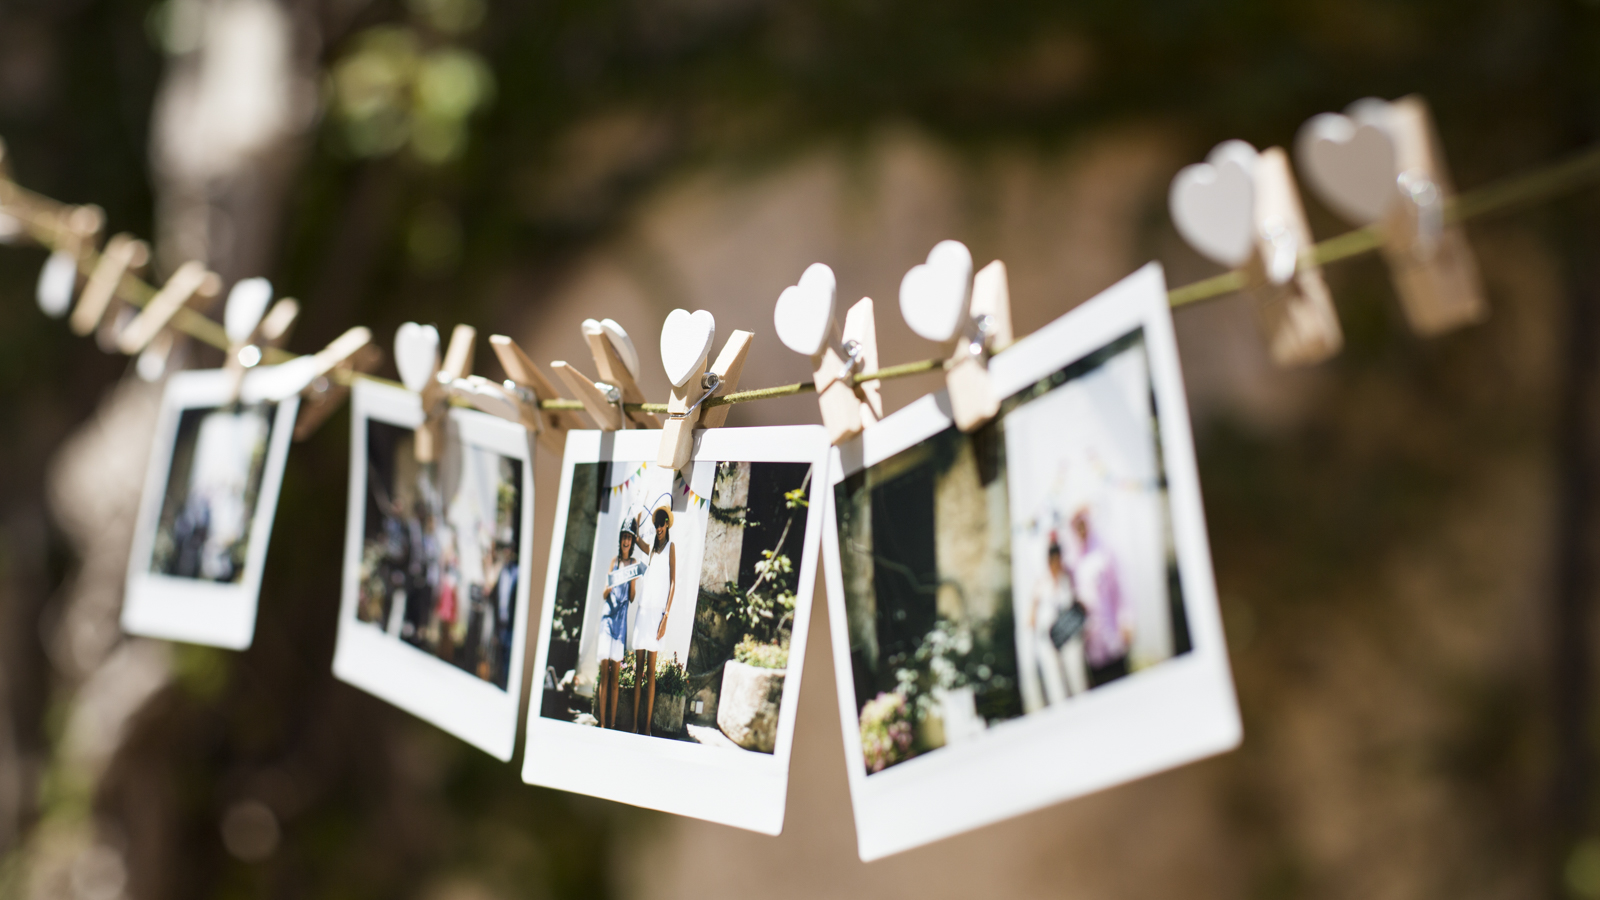 mia-moments-photo-boda-terrassa-mas-bonvilar-fotografia-155.jpg